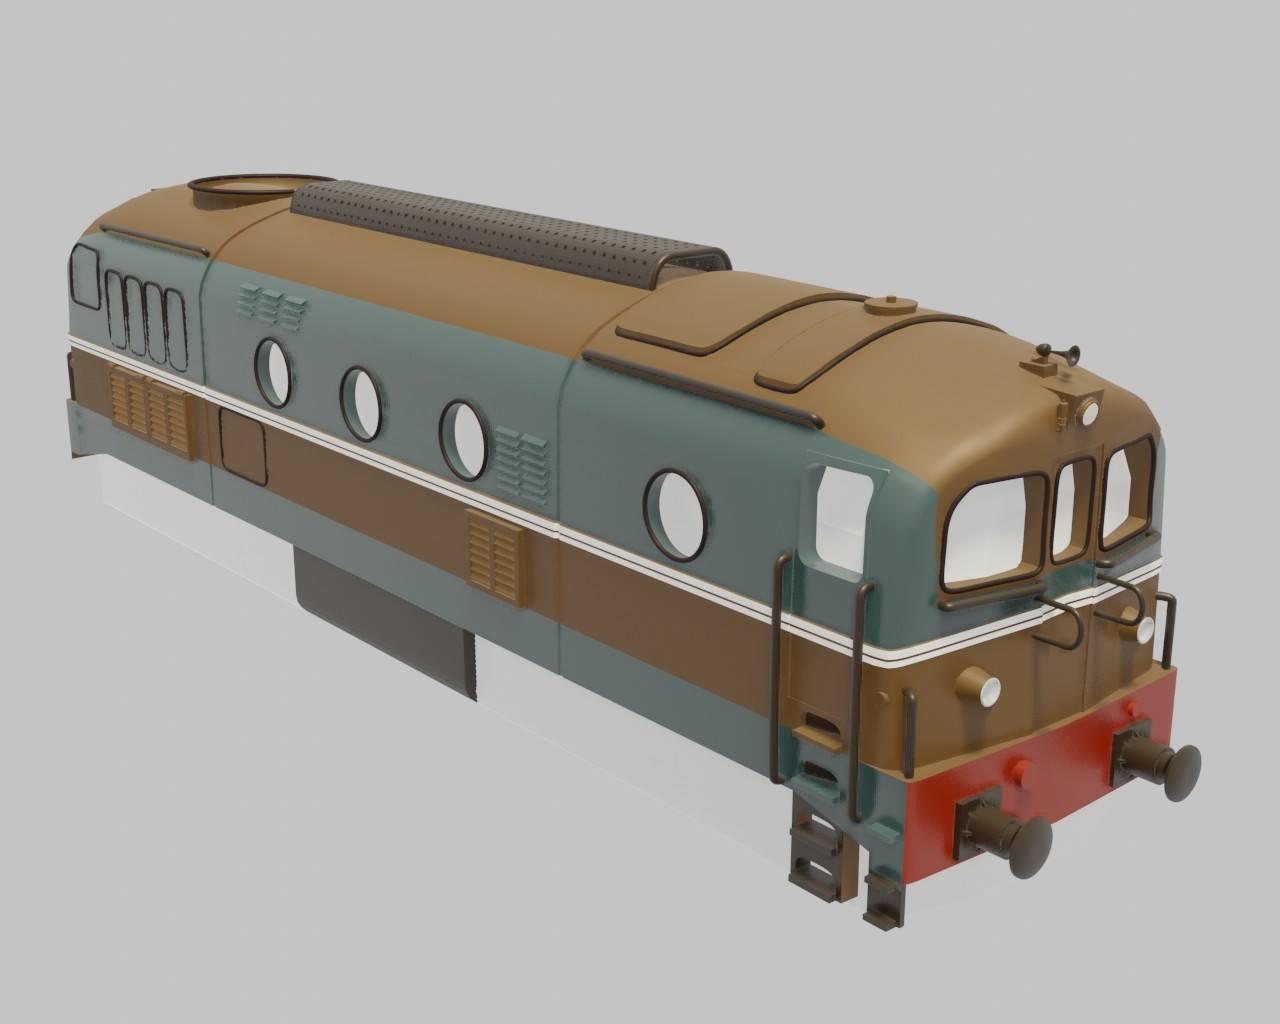 Locomotiva FS D341 in scala HO